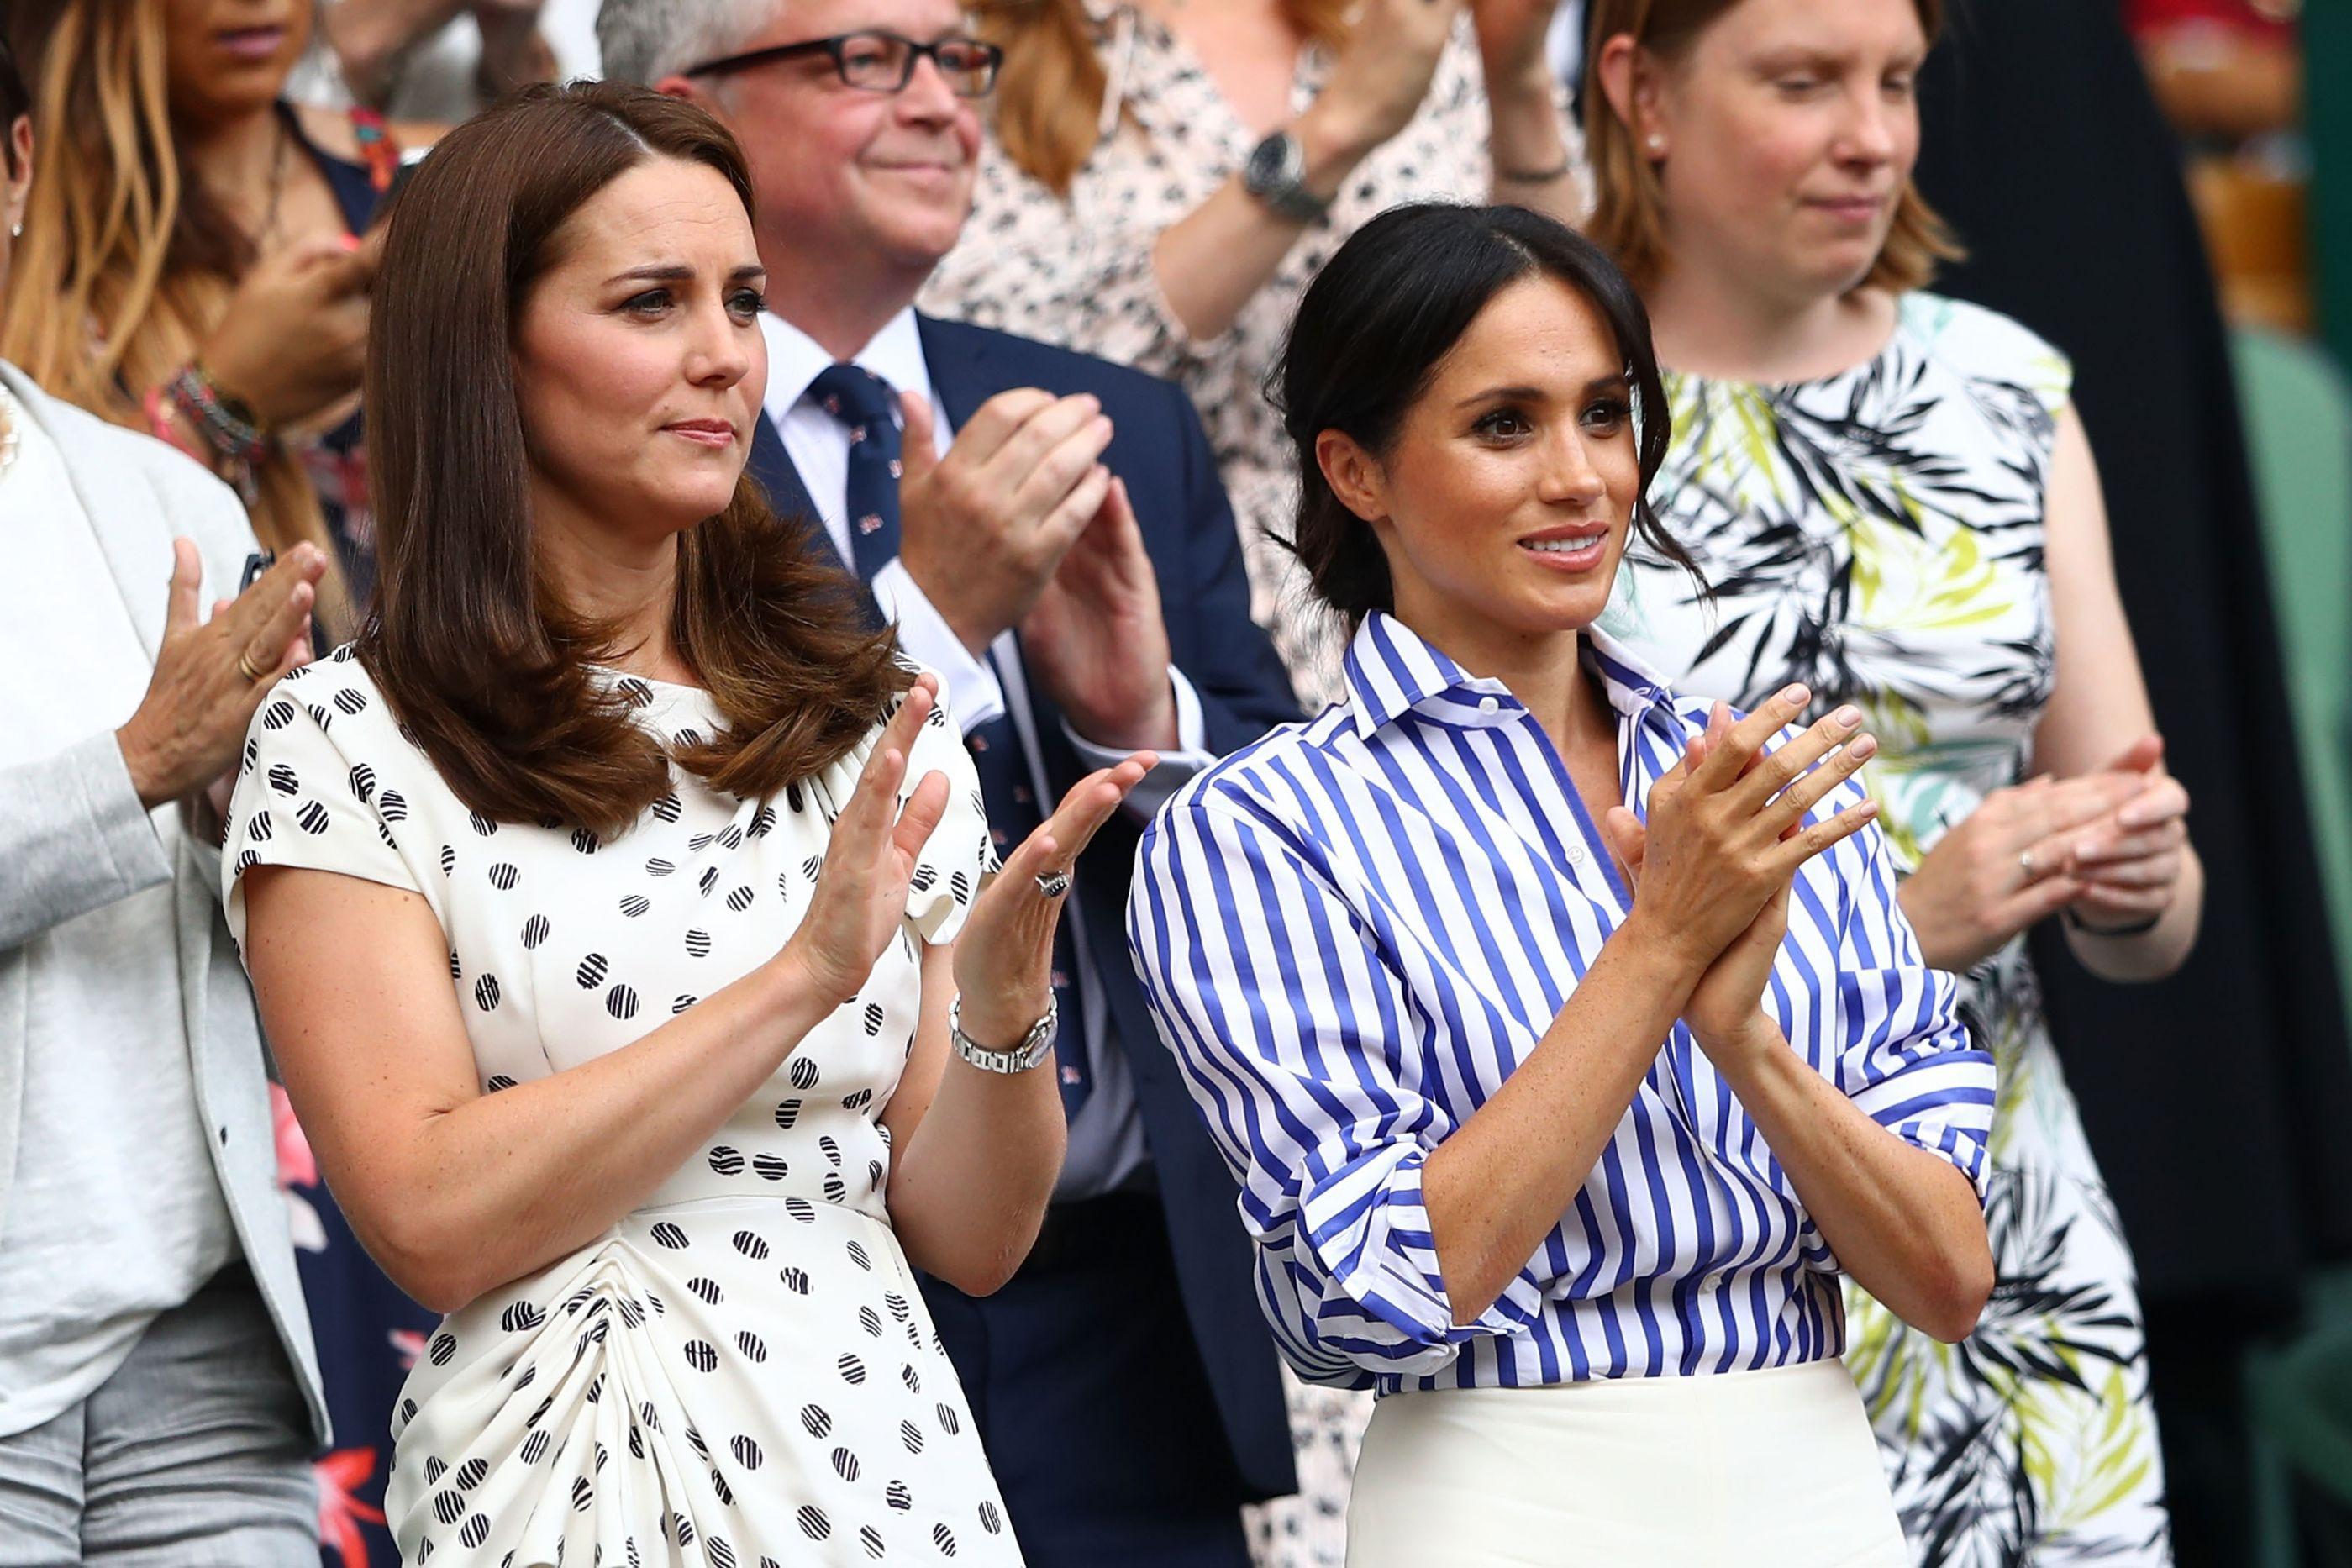 "Kate Middleton estará ""furiosa"" com Meghan Markle. Porquê?"